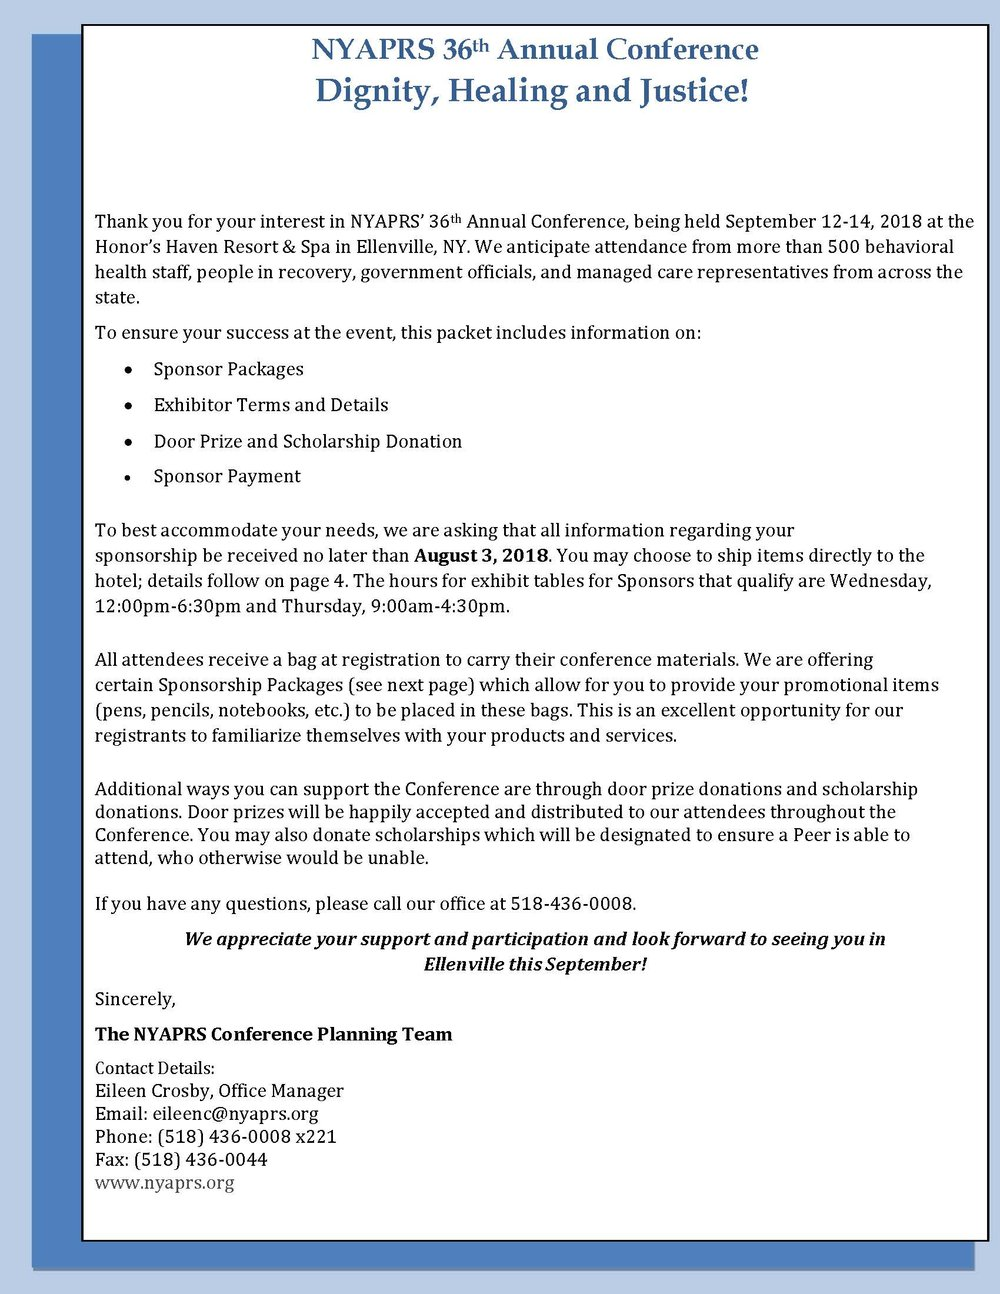 NYAPRS+Sponsor.Exhibitor+Packet+2018_Page_2.jpg